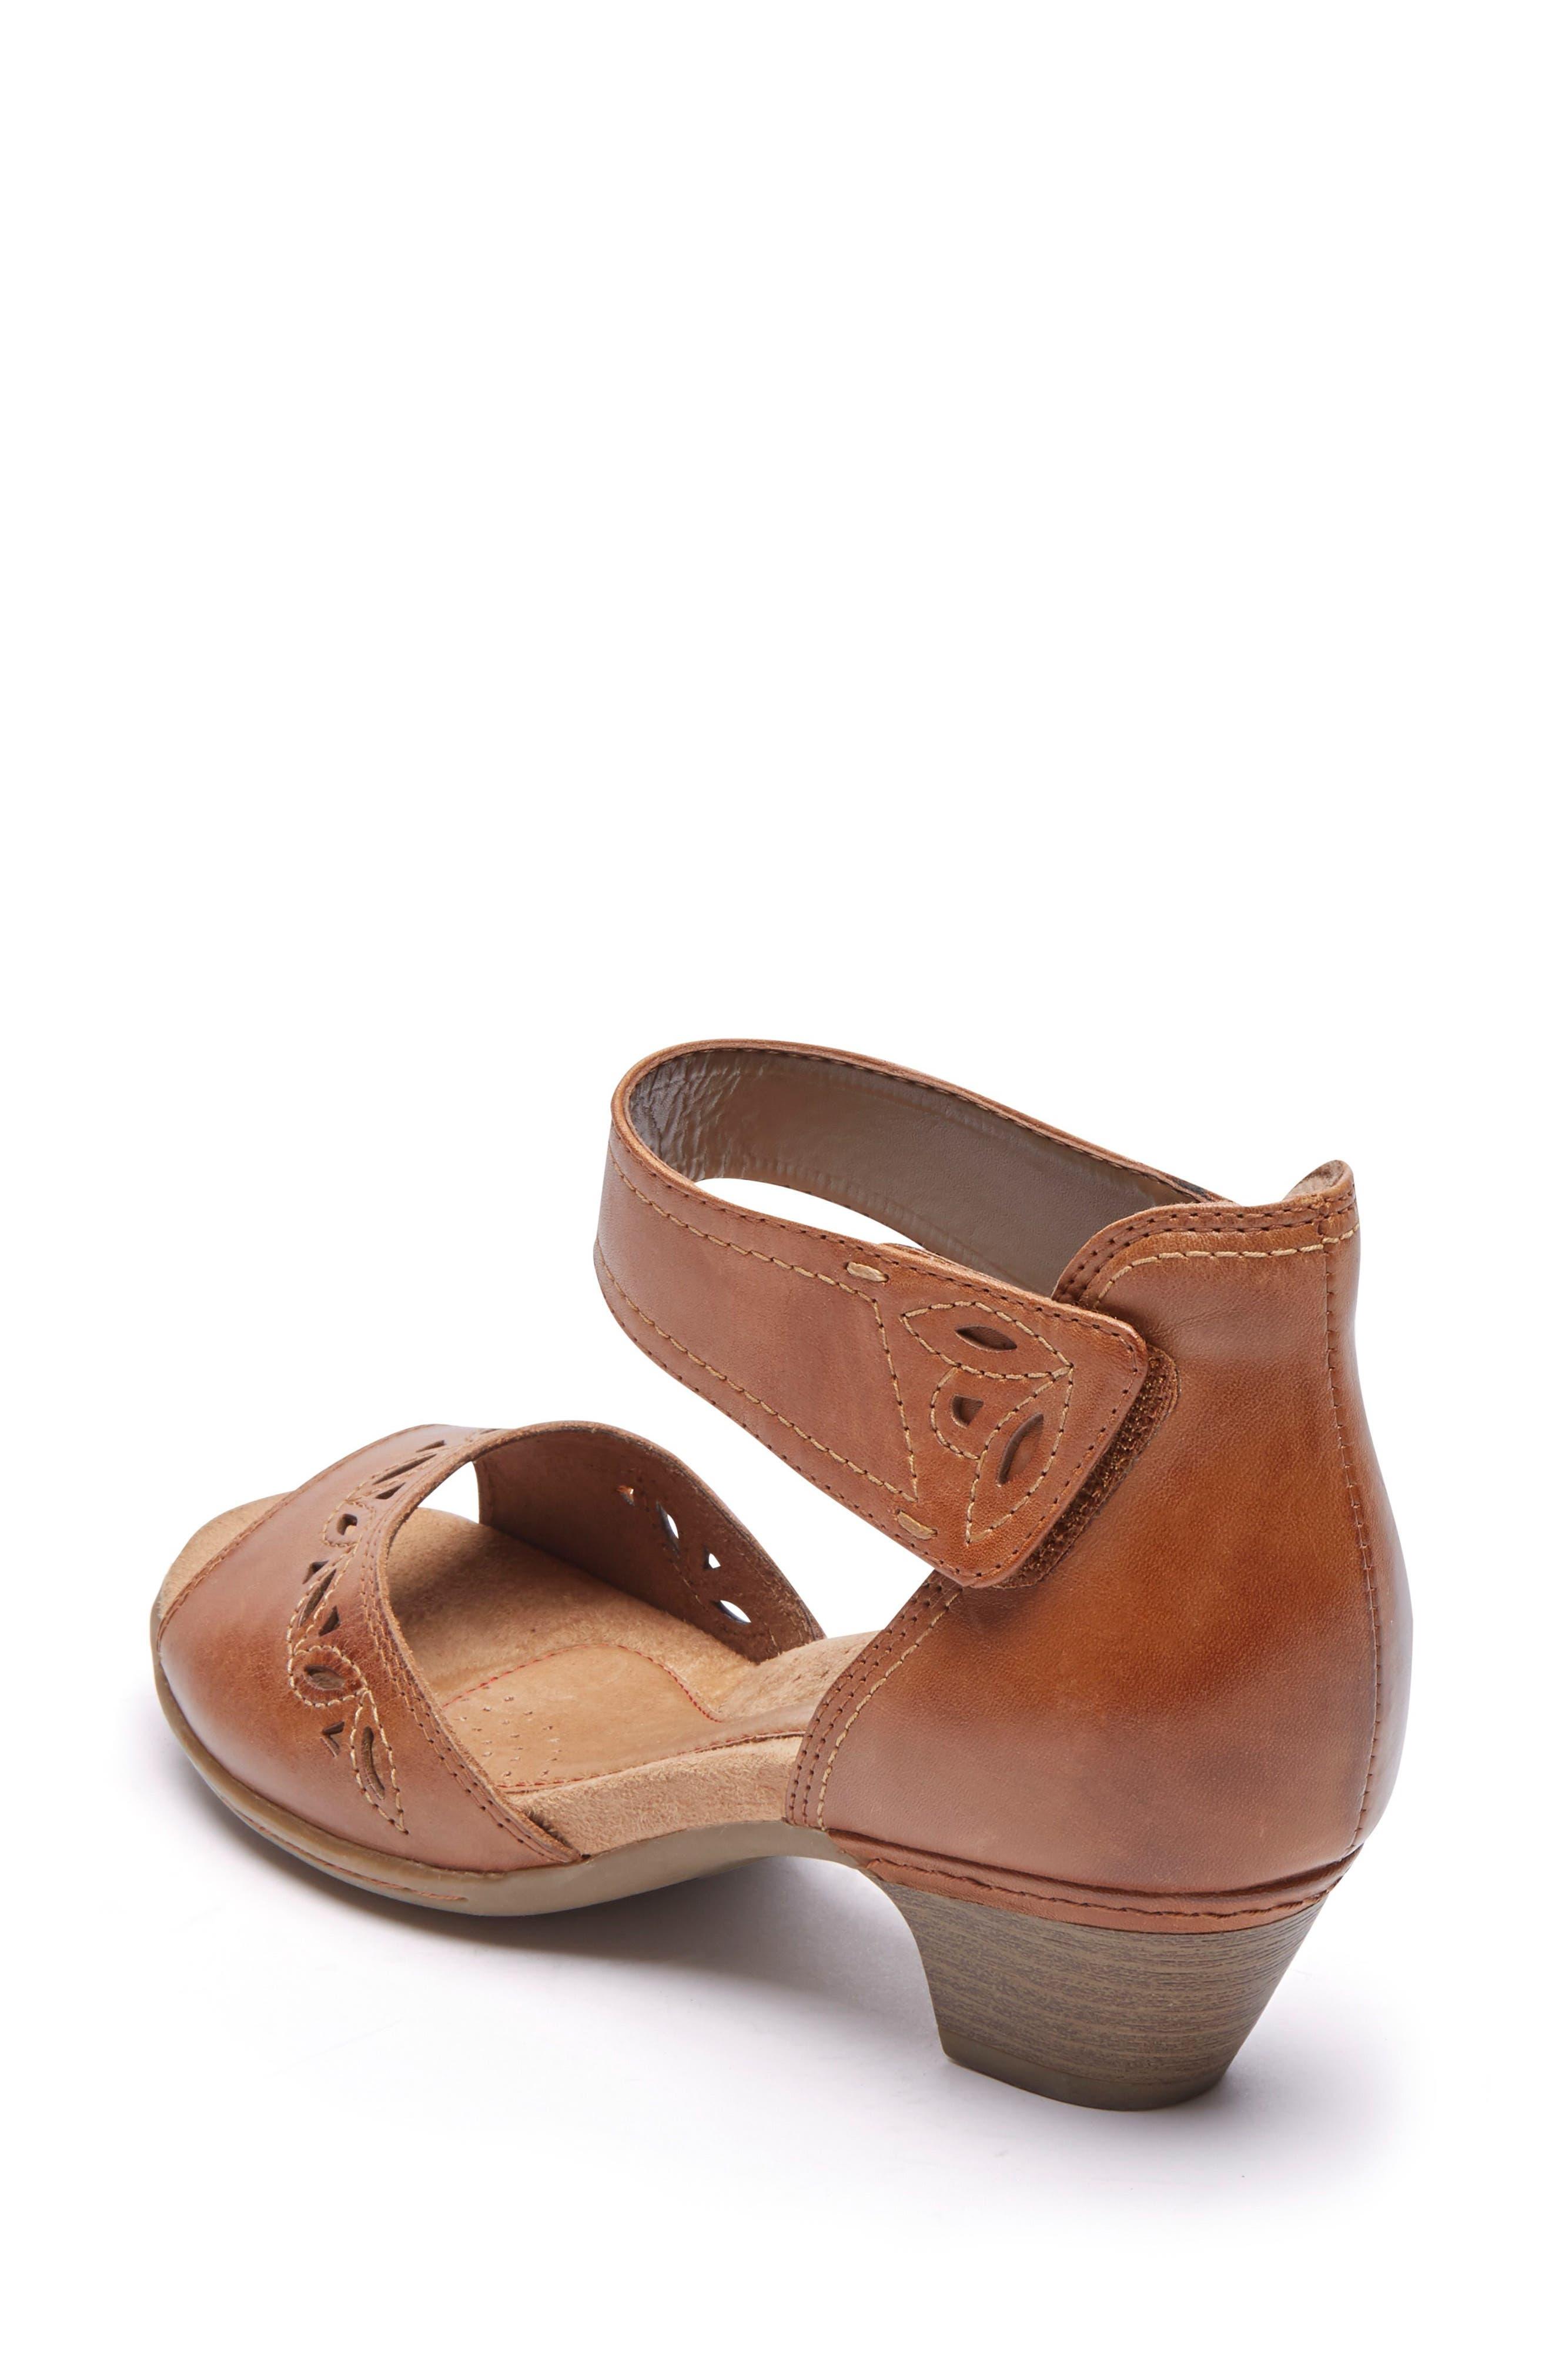 Abbott Perforated Sandal,                             Alternate thumbnail 2, color,                             Tan Leather